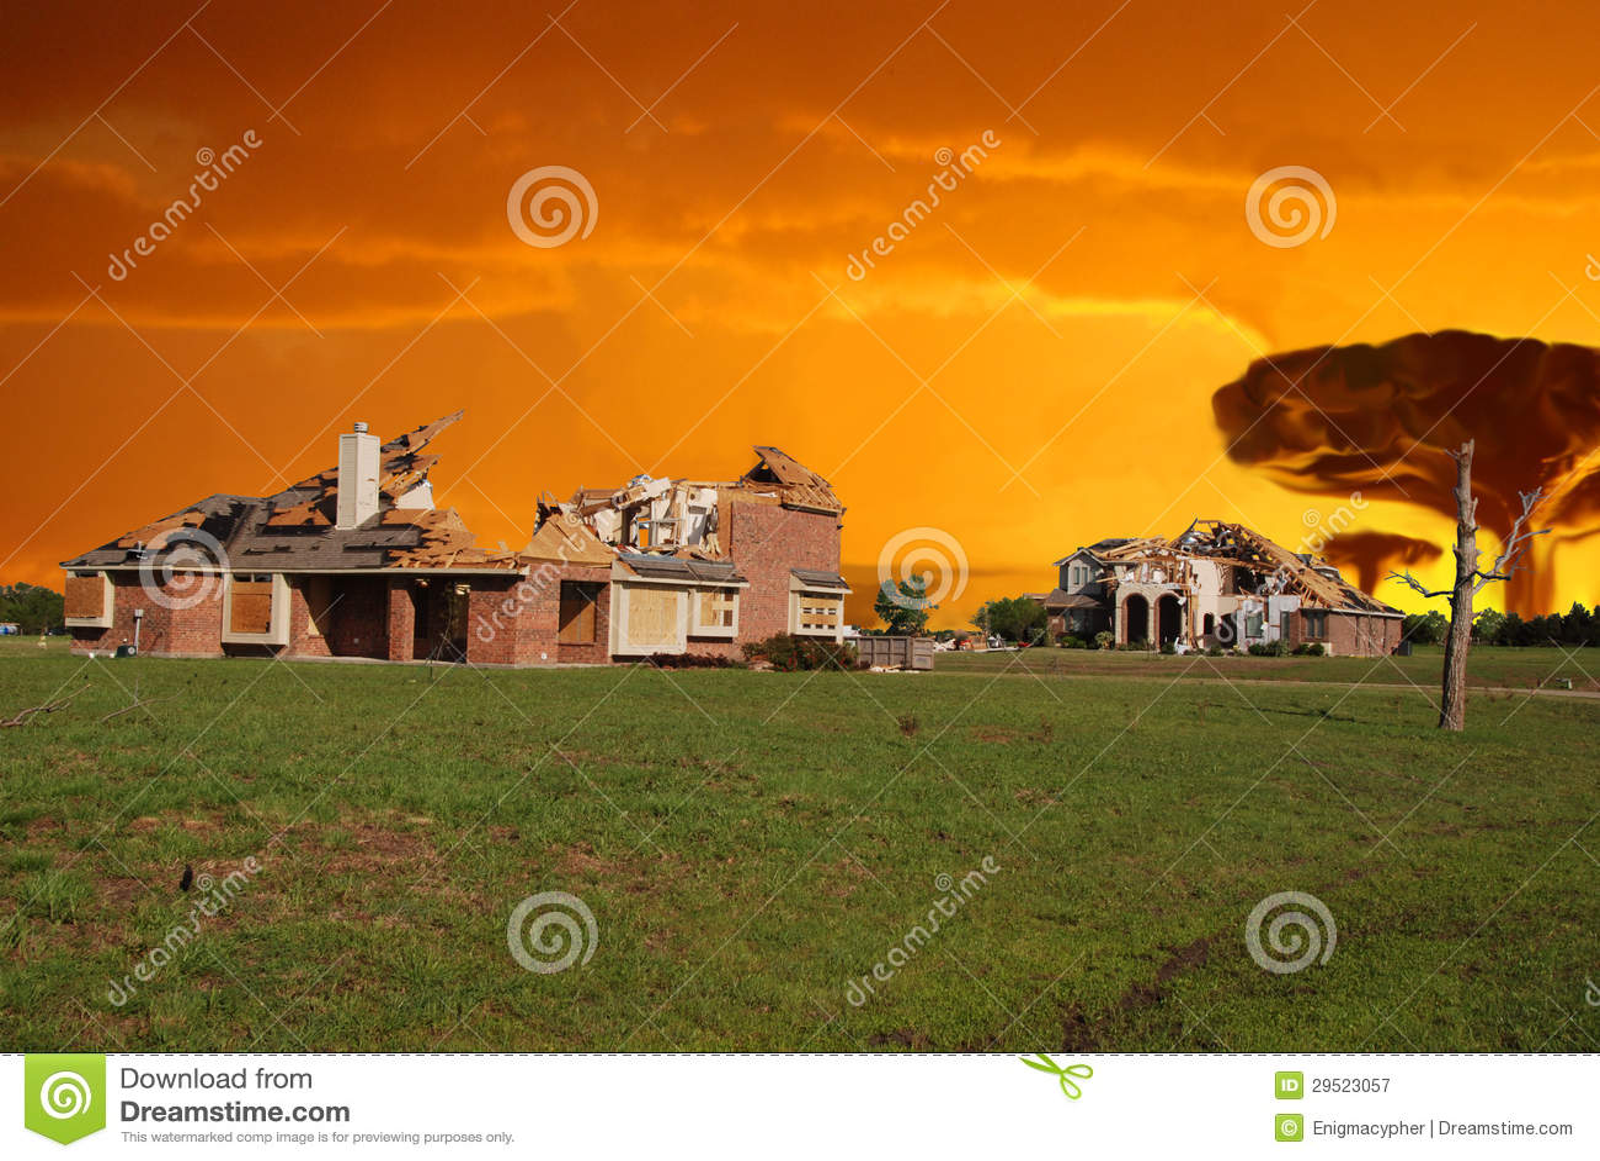 Doomsday Destruction